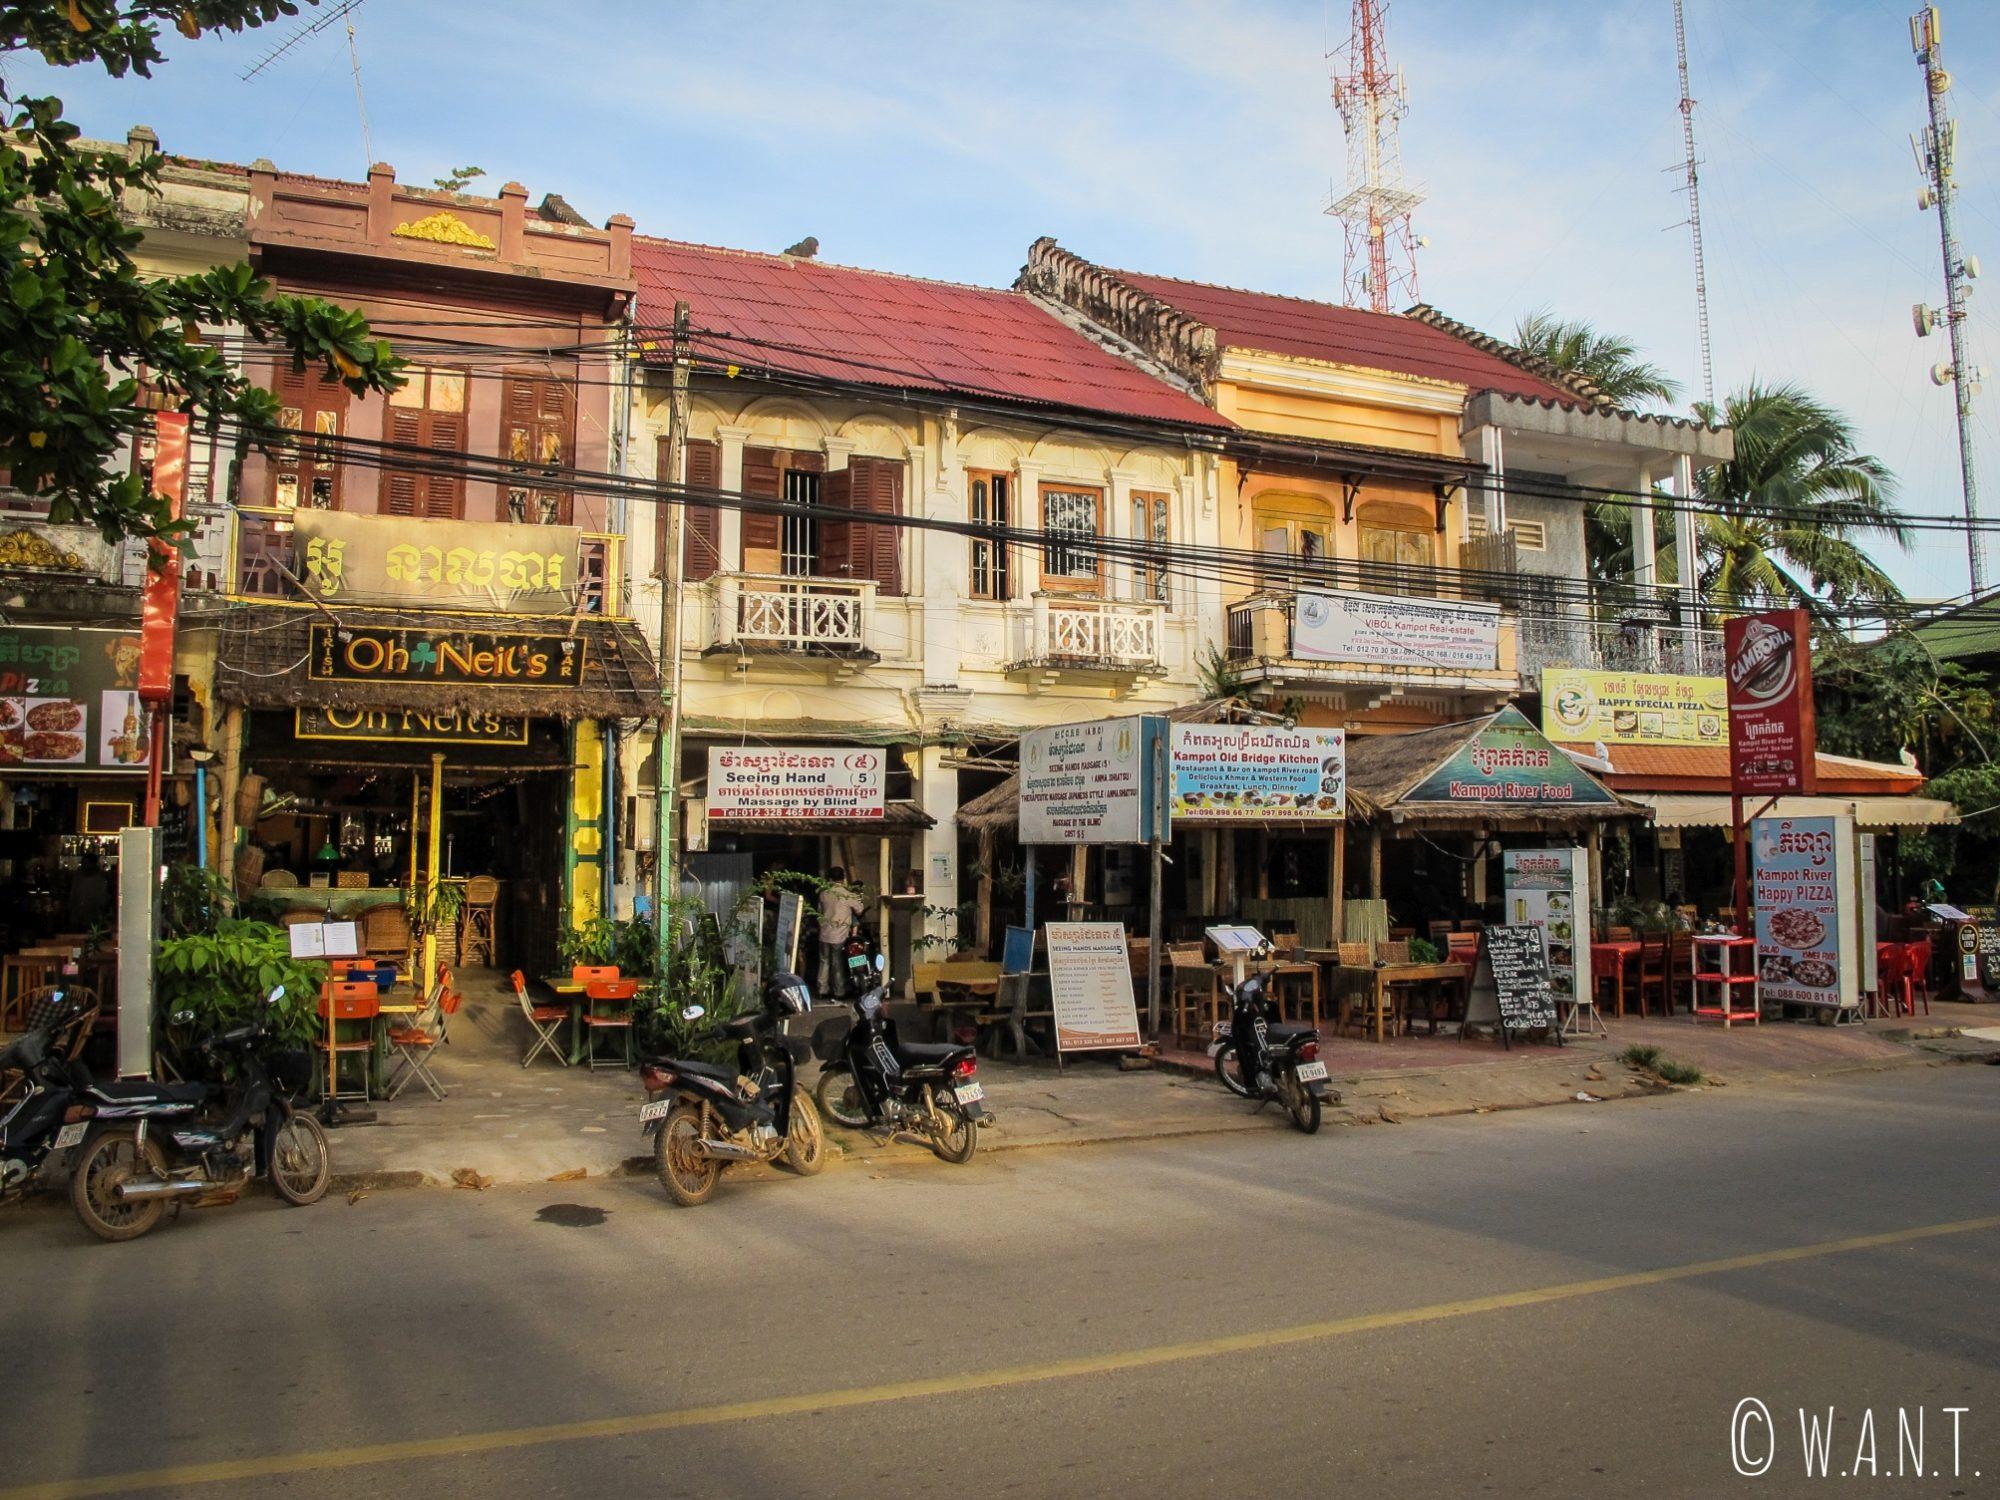 Les restaurants sont nombreux dans les rues de Kampot